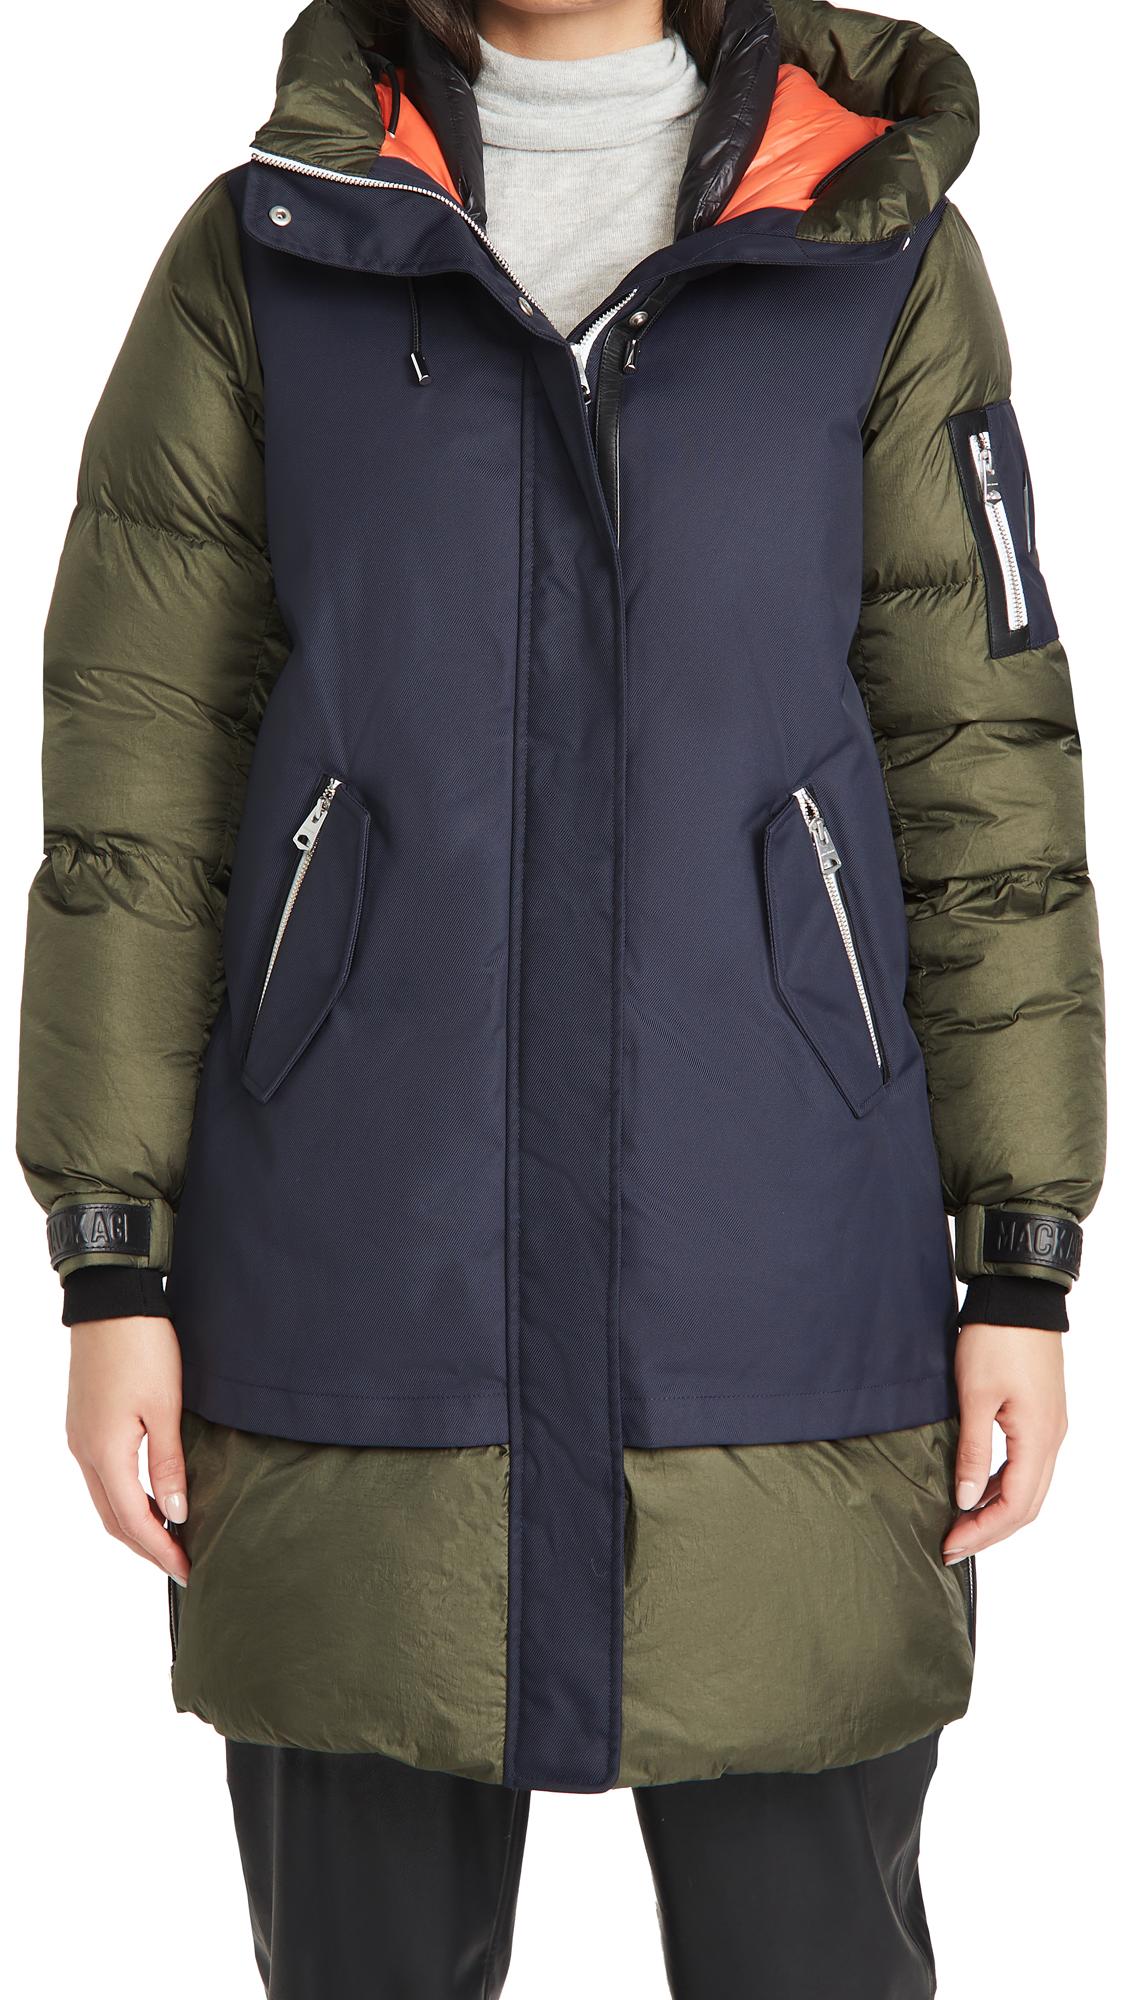 Mackage Inari Down Jacket